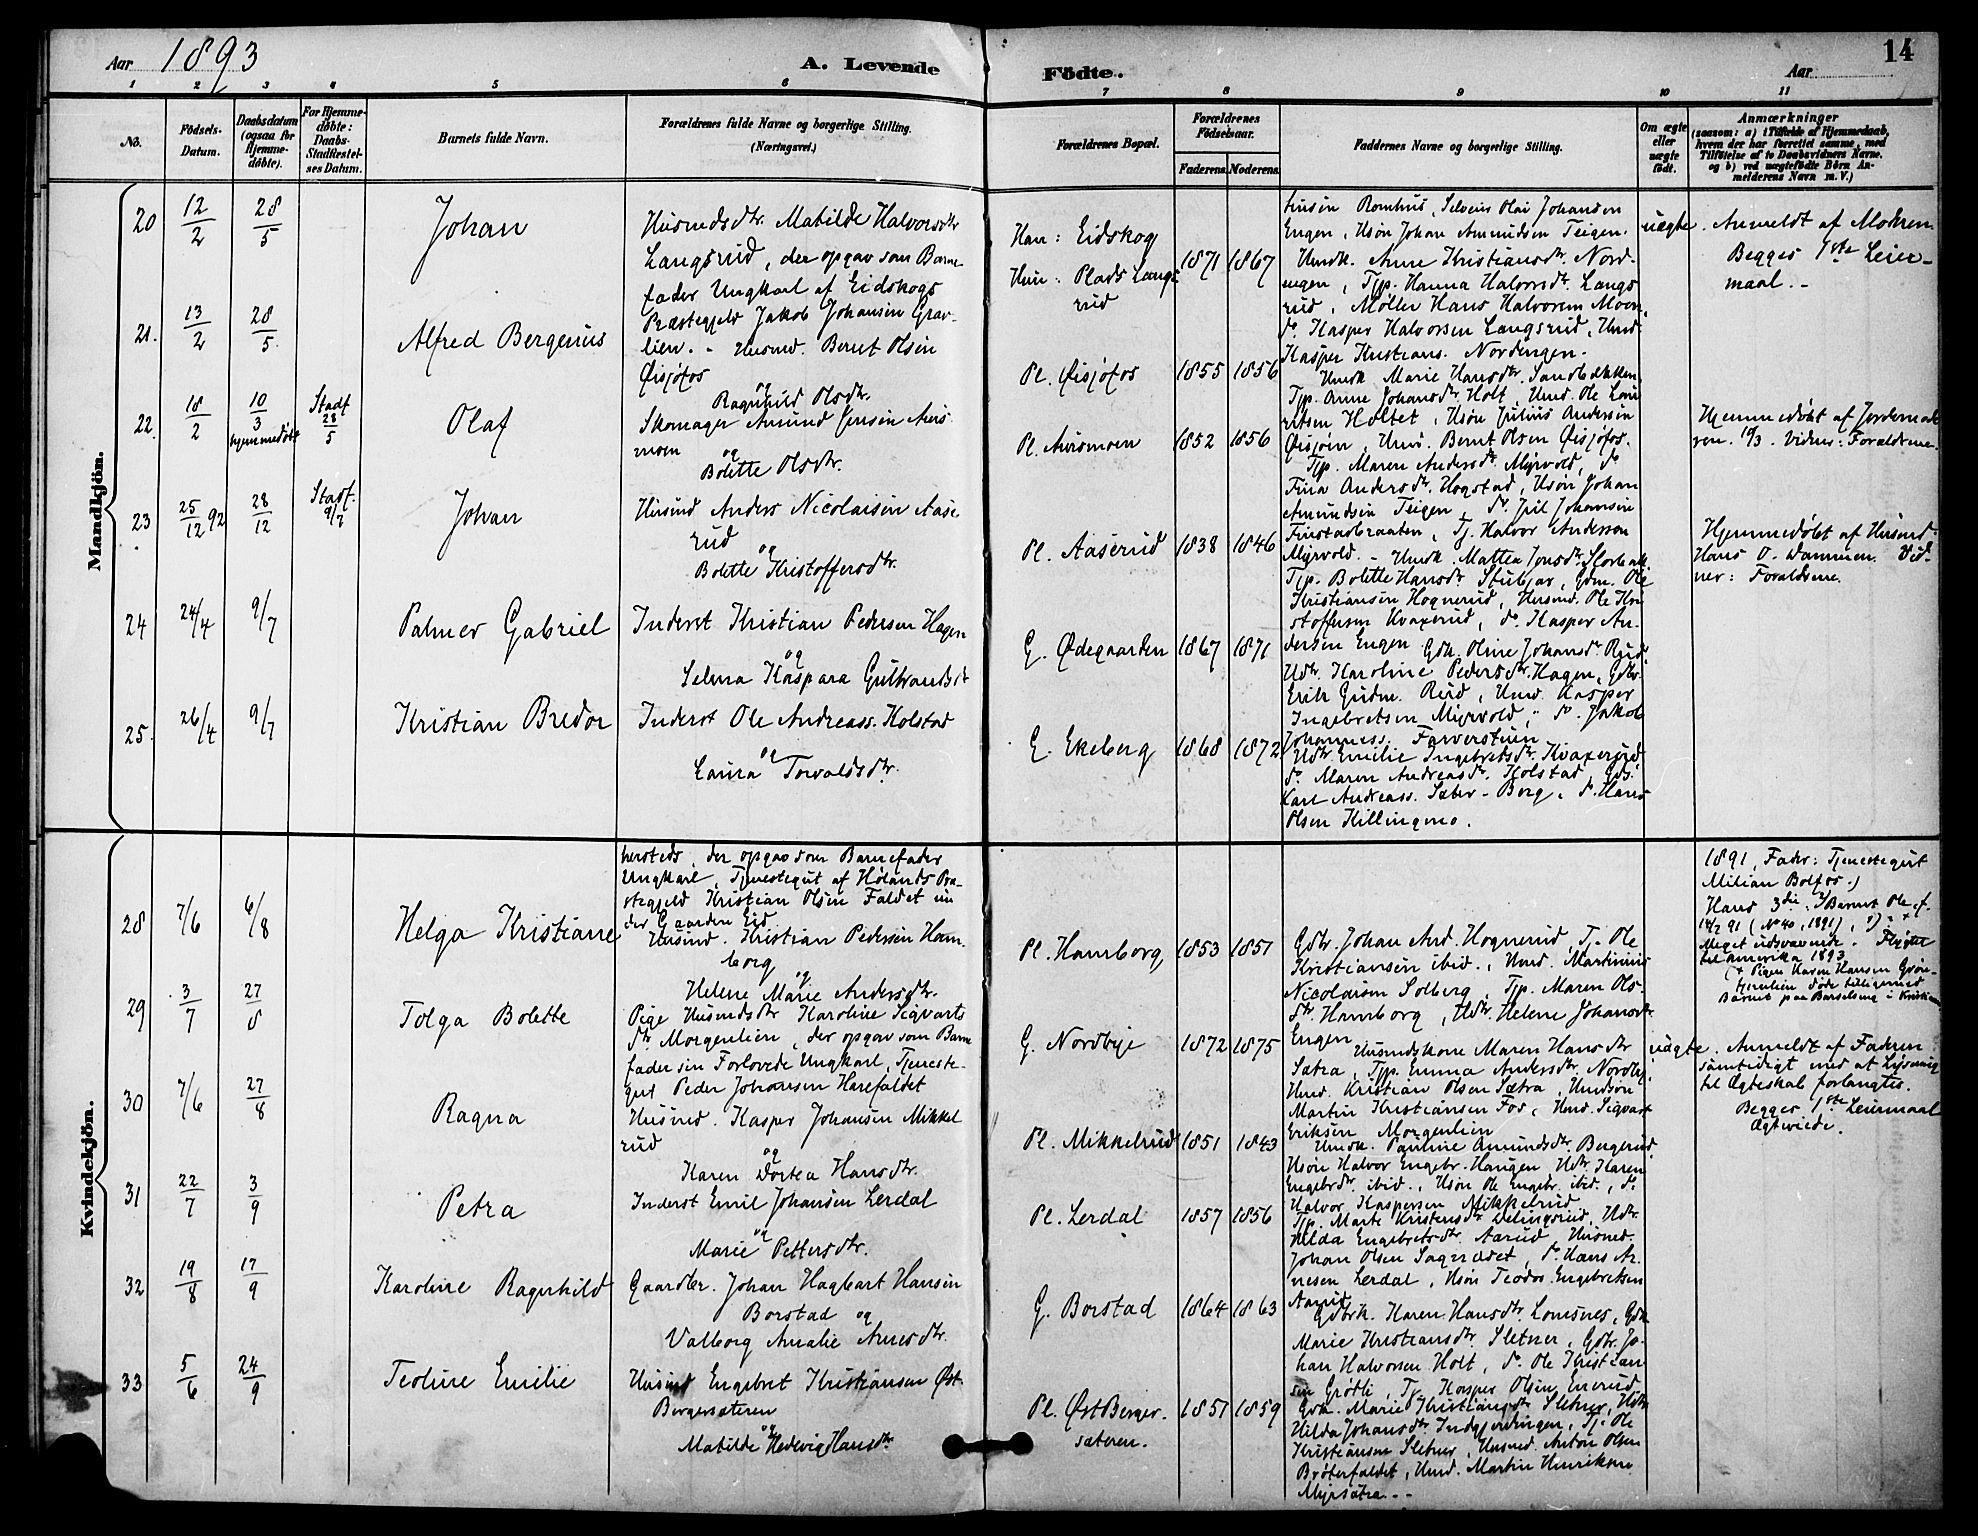 SAO, Aurskog prestekontor Kirkebøker, F/Fa/L0009: Ministerialbok nr. I 9, 1891-1898, s. 14